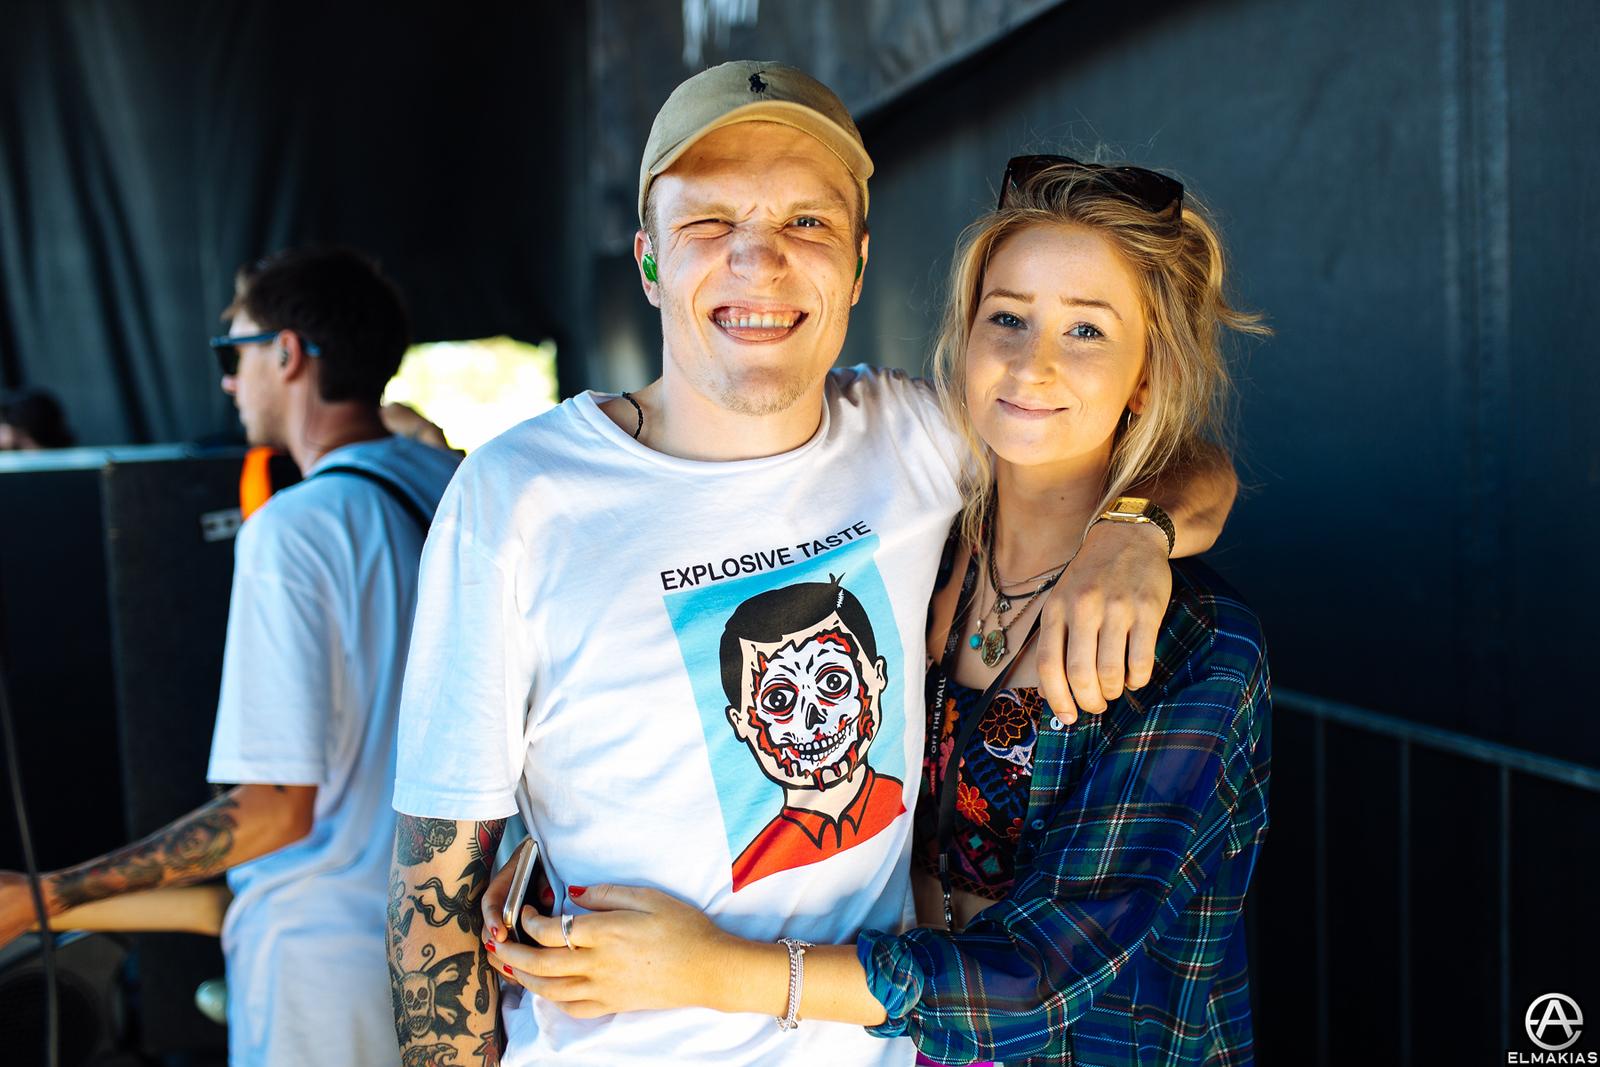 Ben Barlow of Neck Deep at Vans Warped Tour 2015 by Adam Elmakias